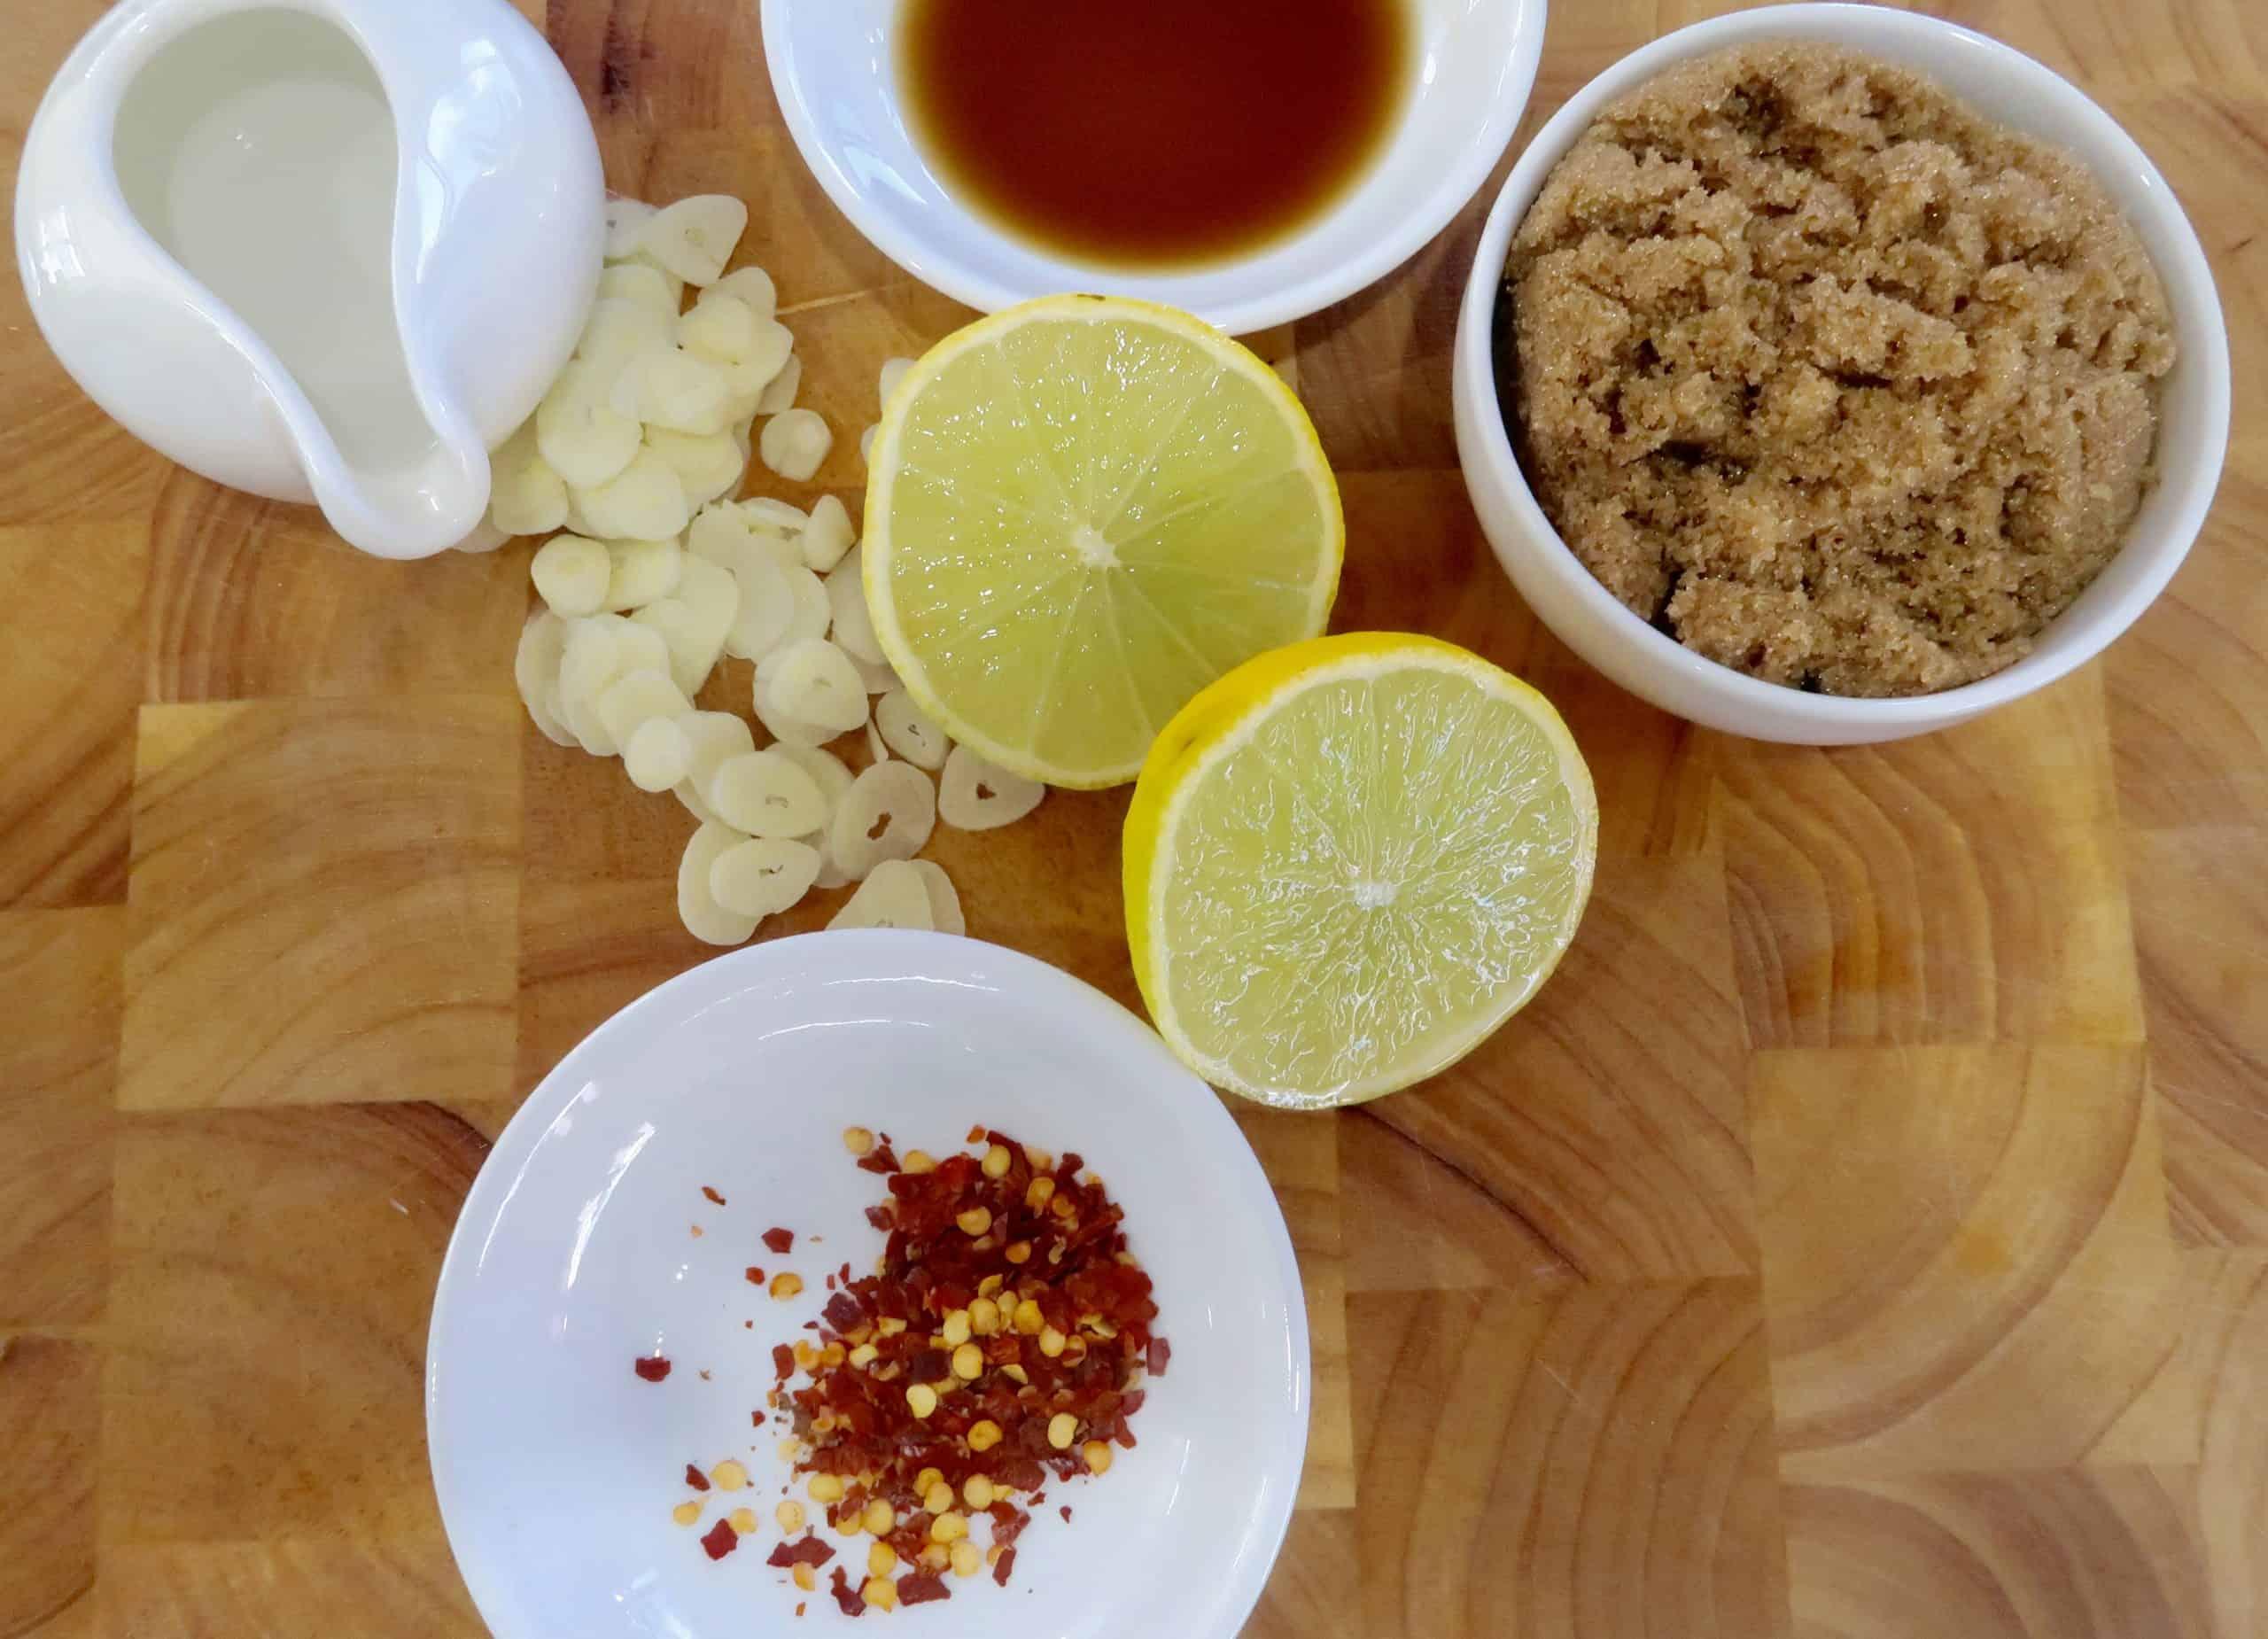 chilli caramel salmon salad ingredients for making chill caramel sauce